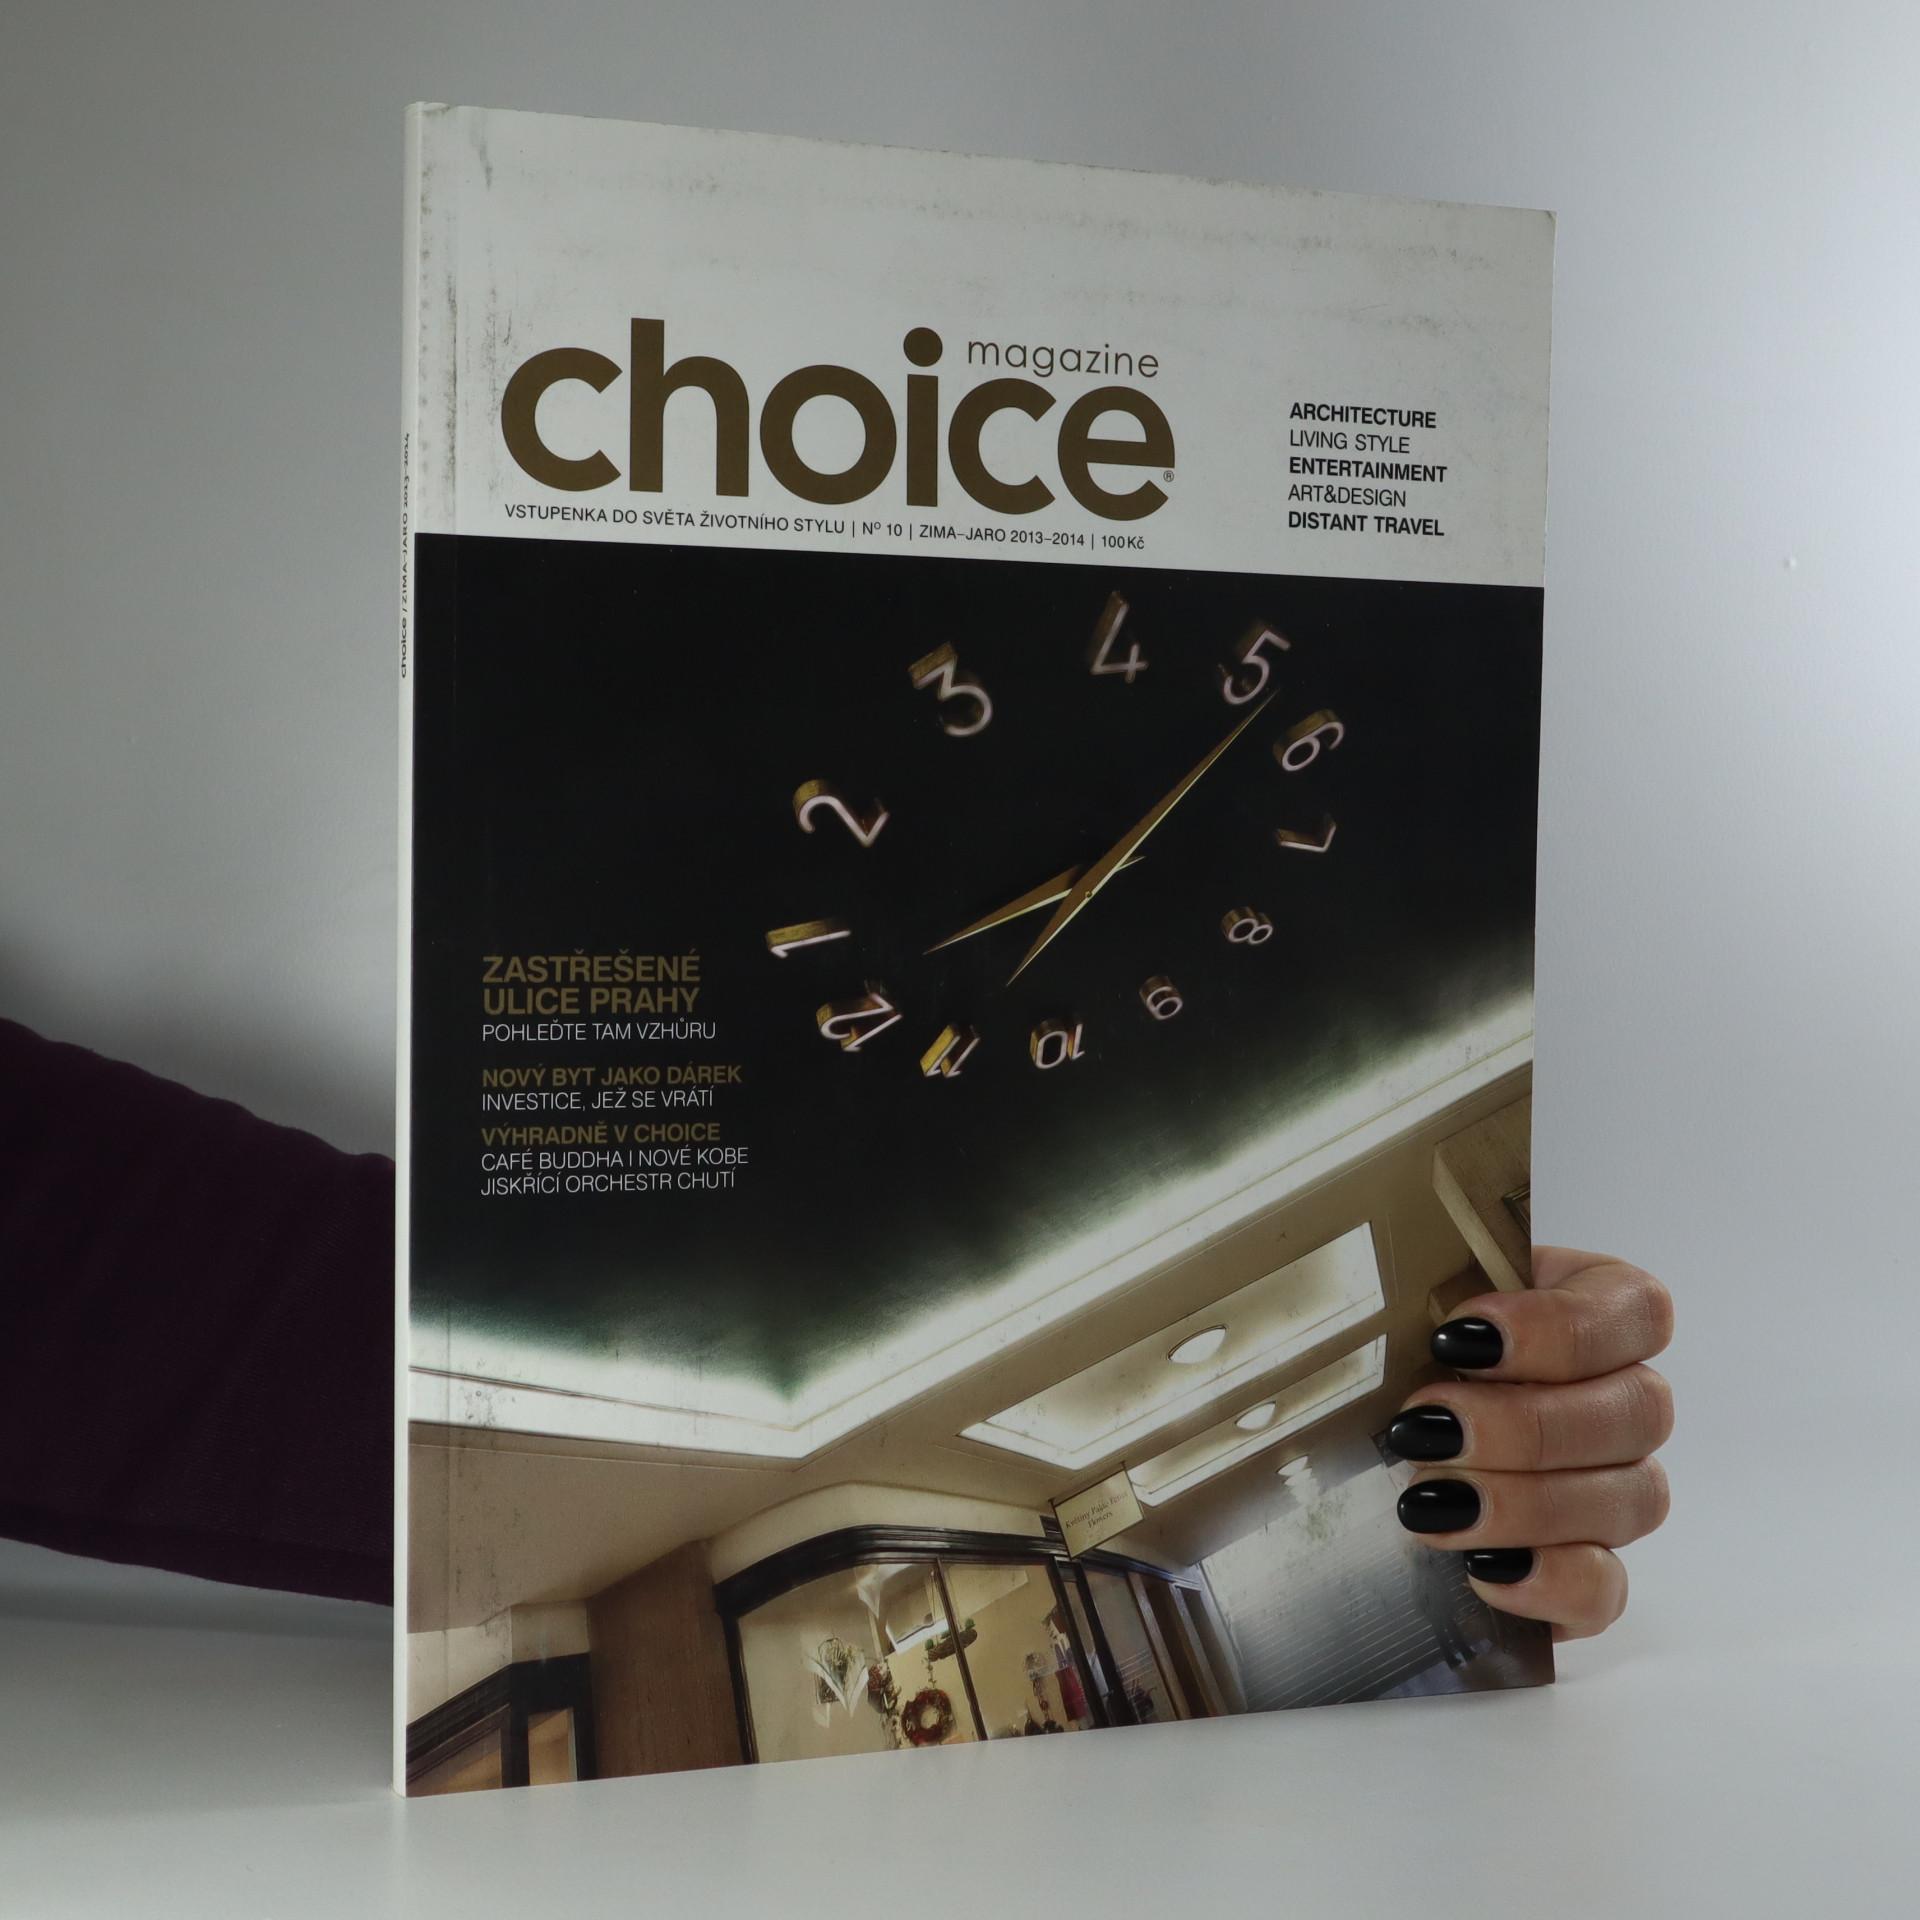 antikvární kniha Choice magazine, neuveden